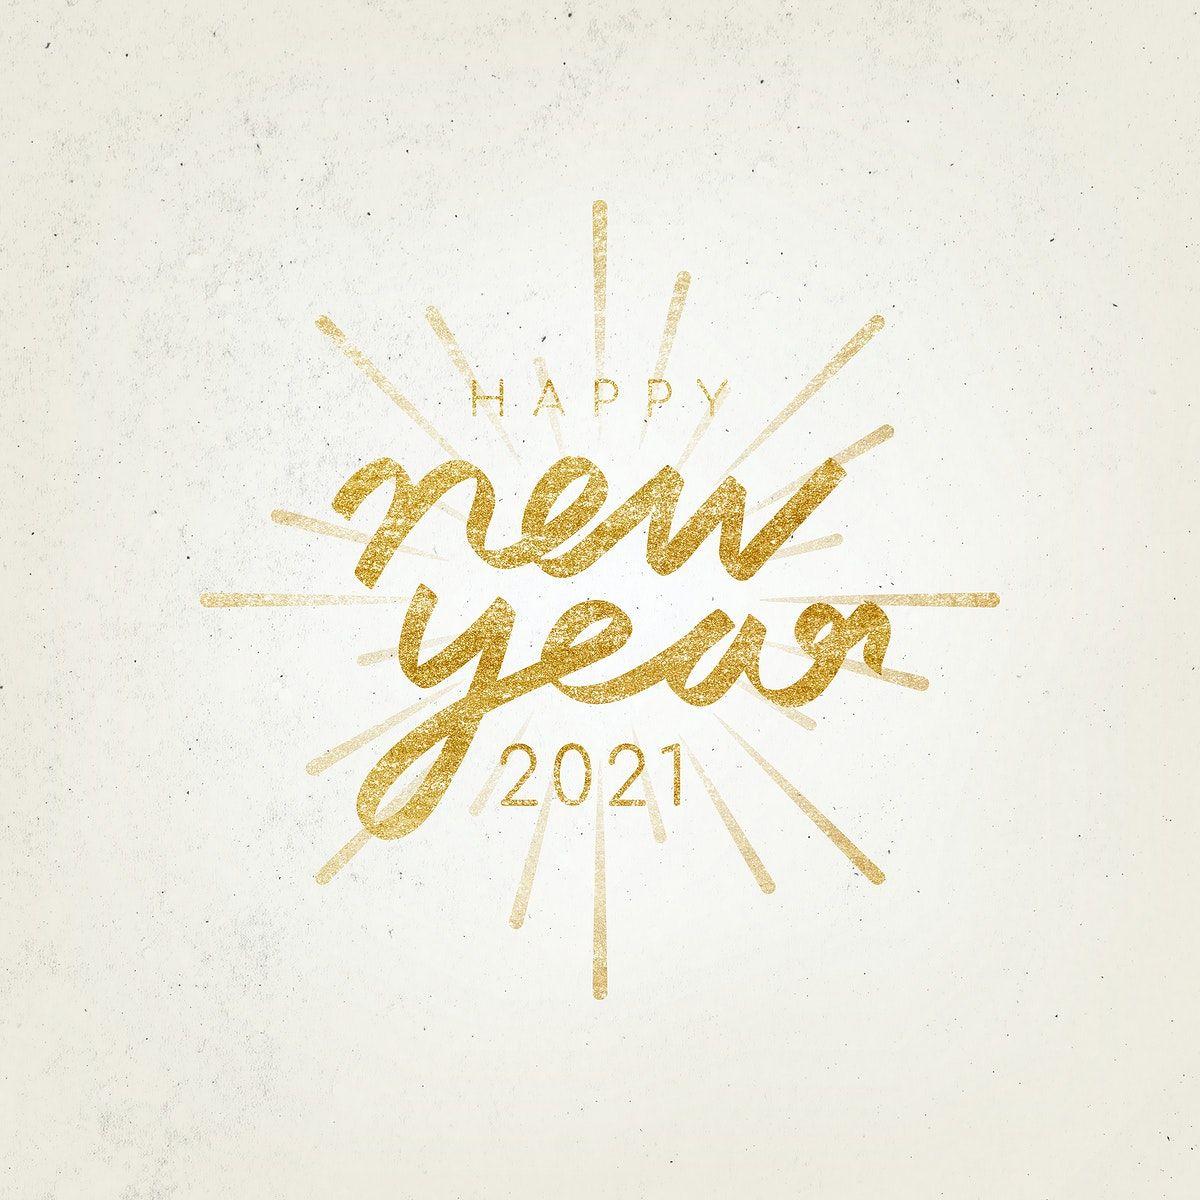 Happy New Year 2021 typography illustration free image